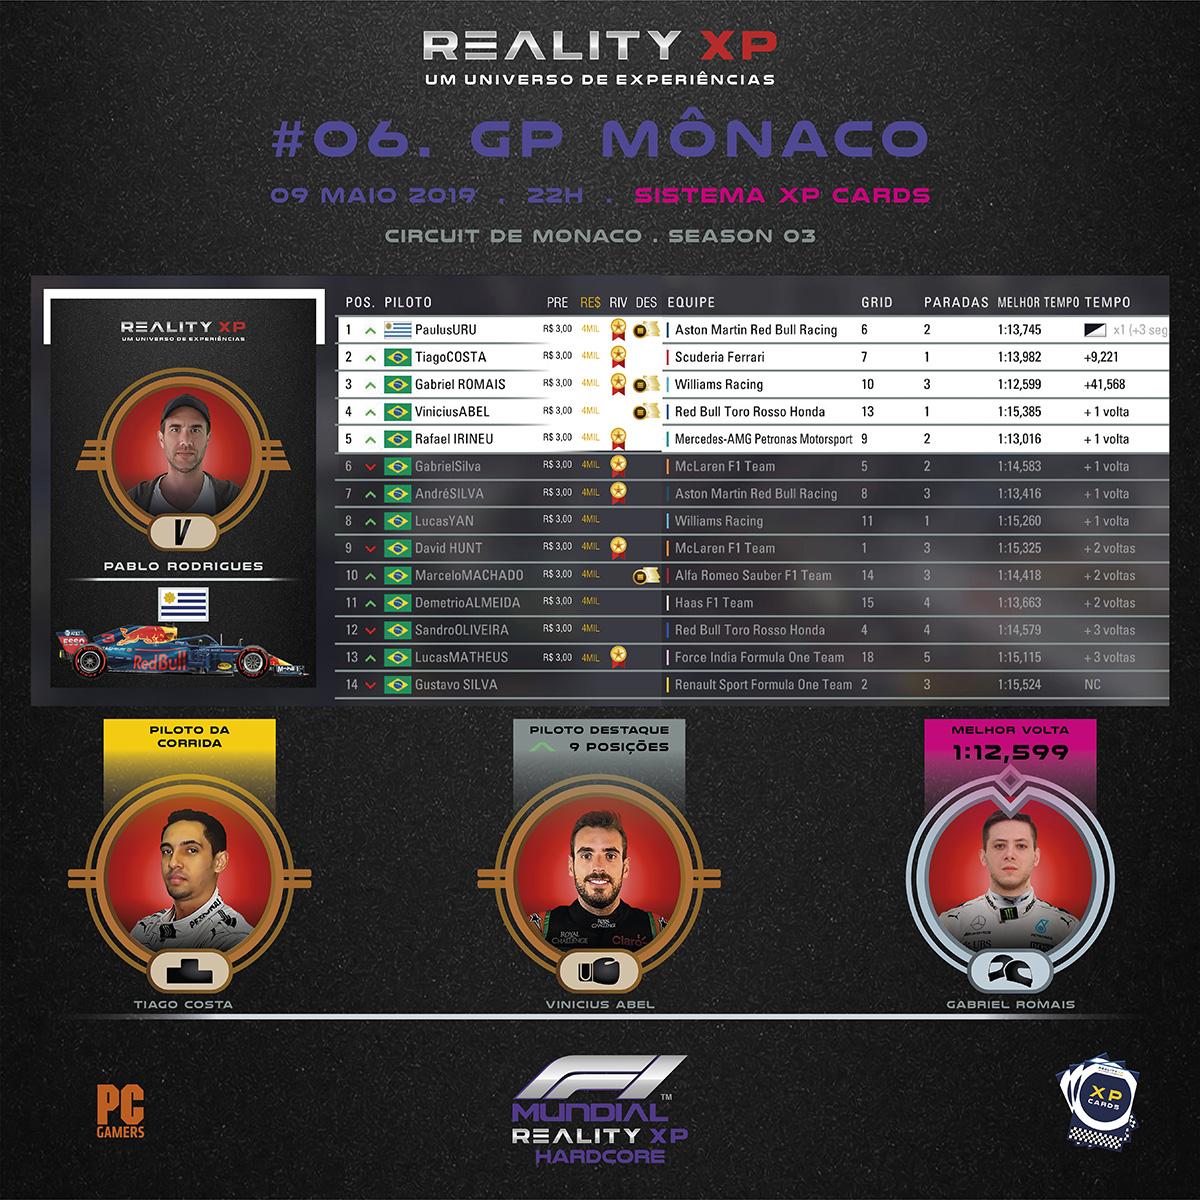 RealityXP_Mundial_RS_PC_HARDCORE_ETAPA_6_4